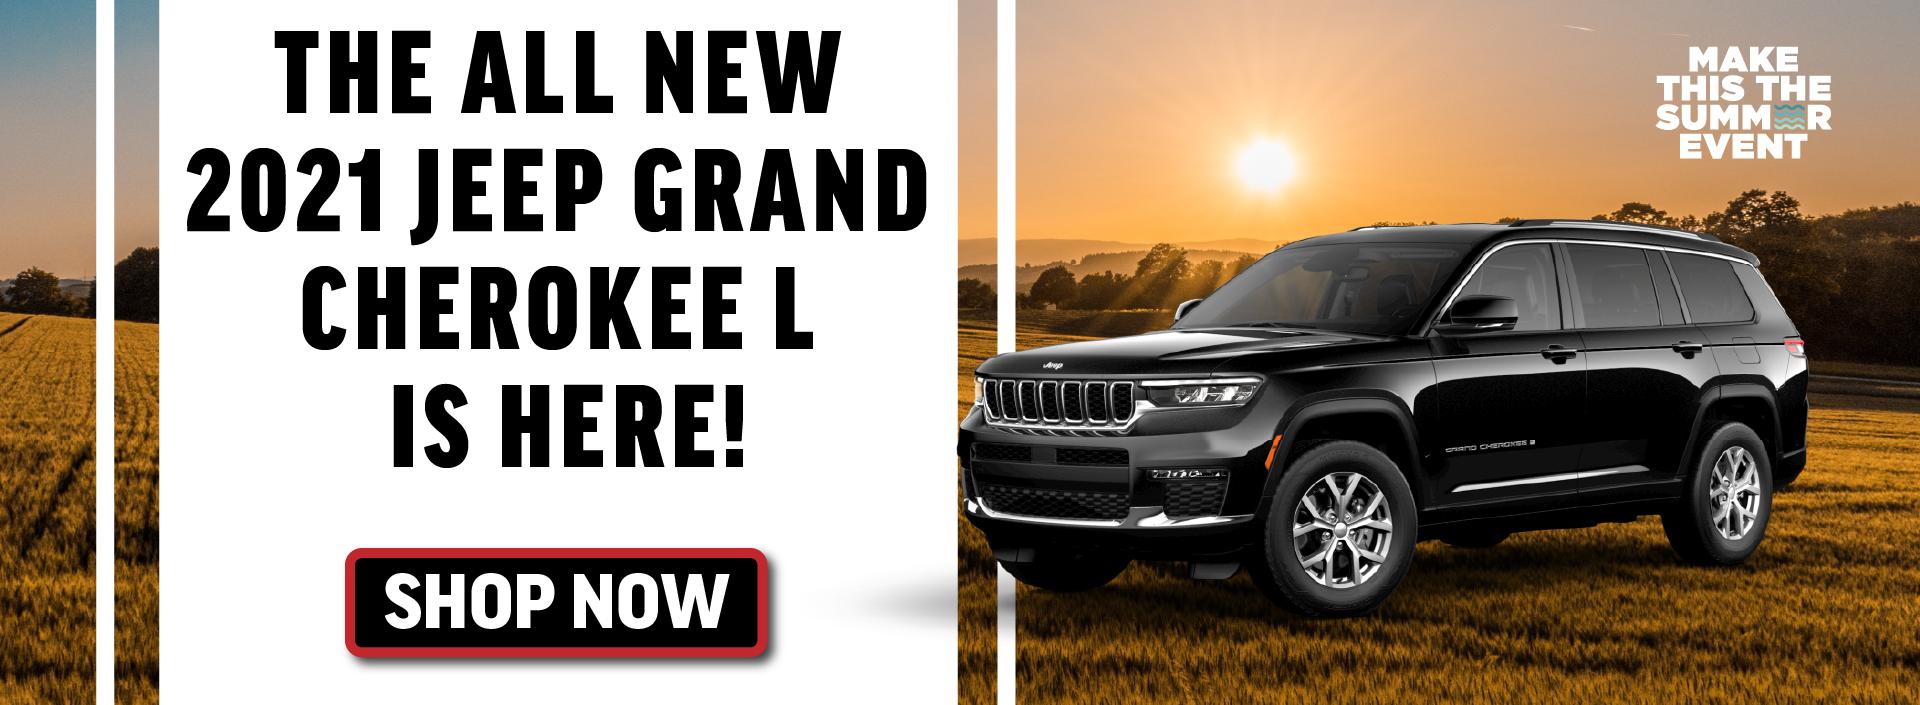 2021 Jeep Grand Cherokee L_August